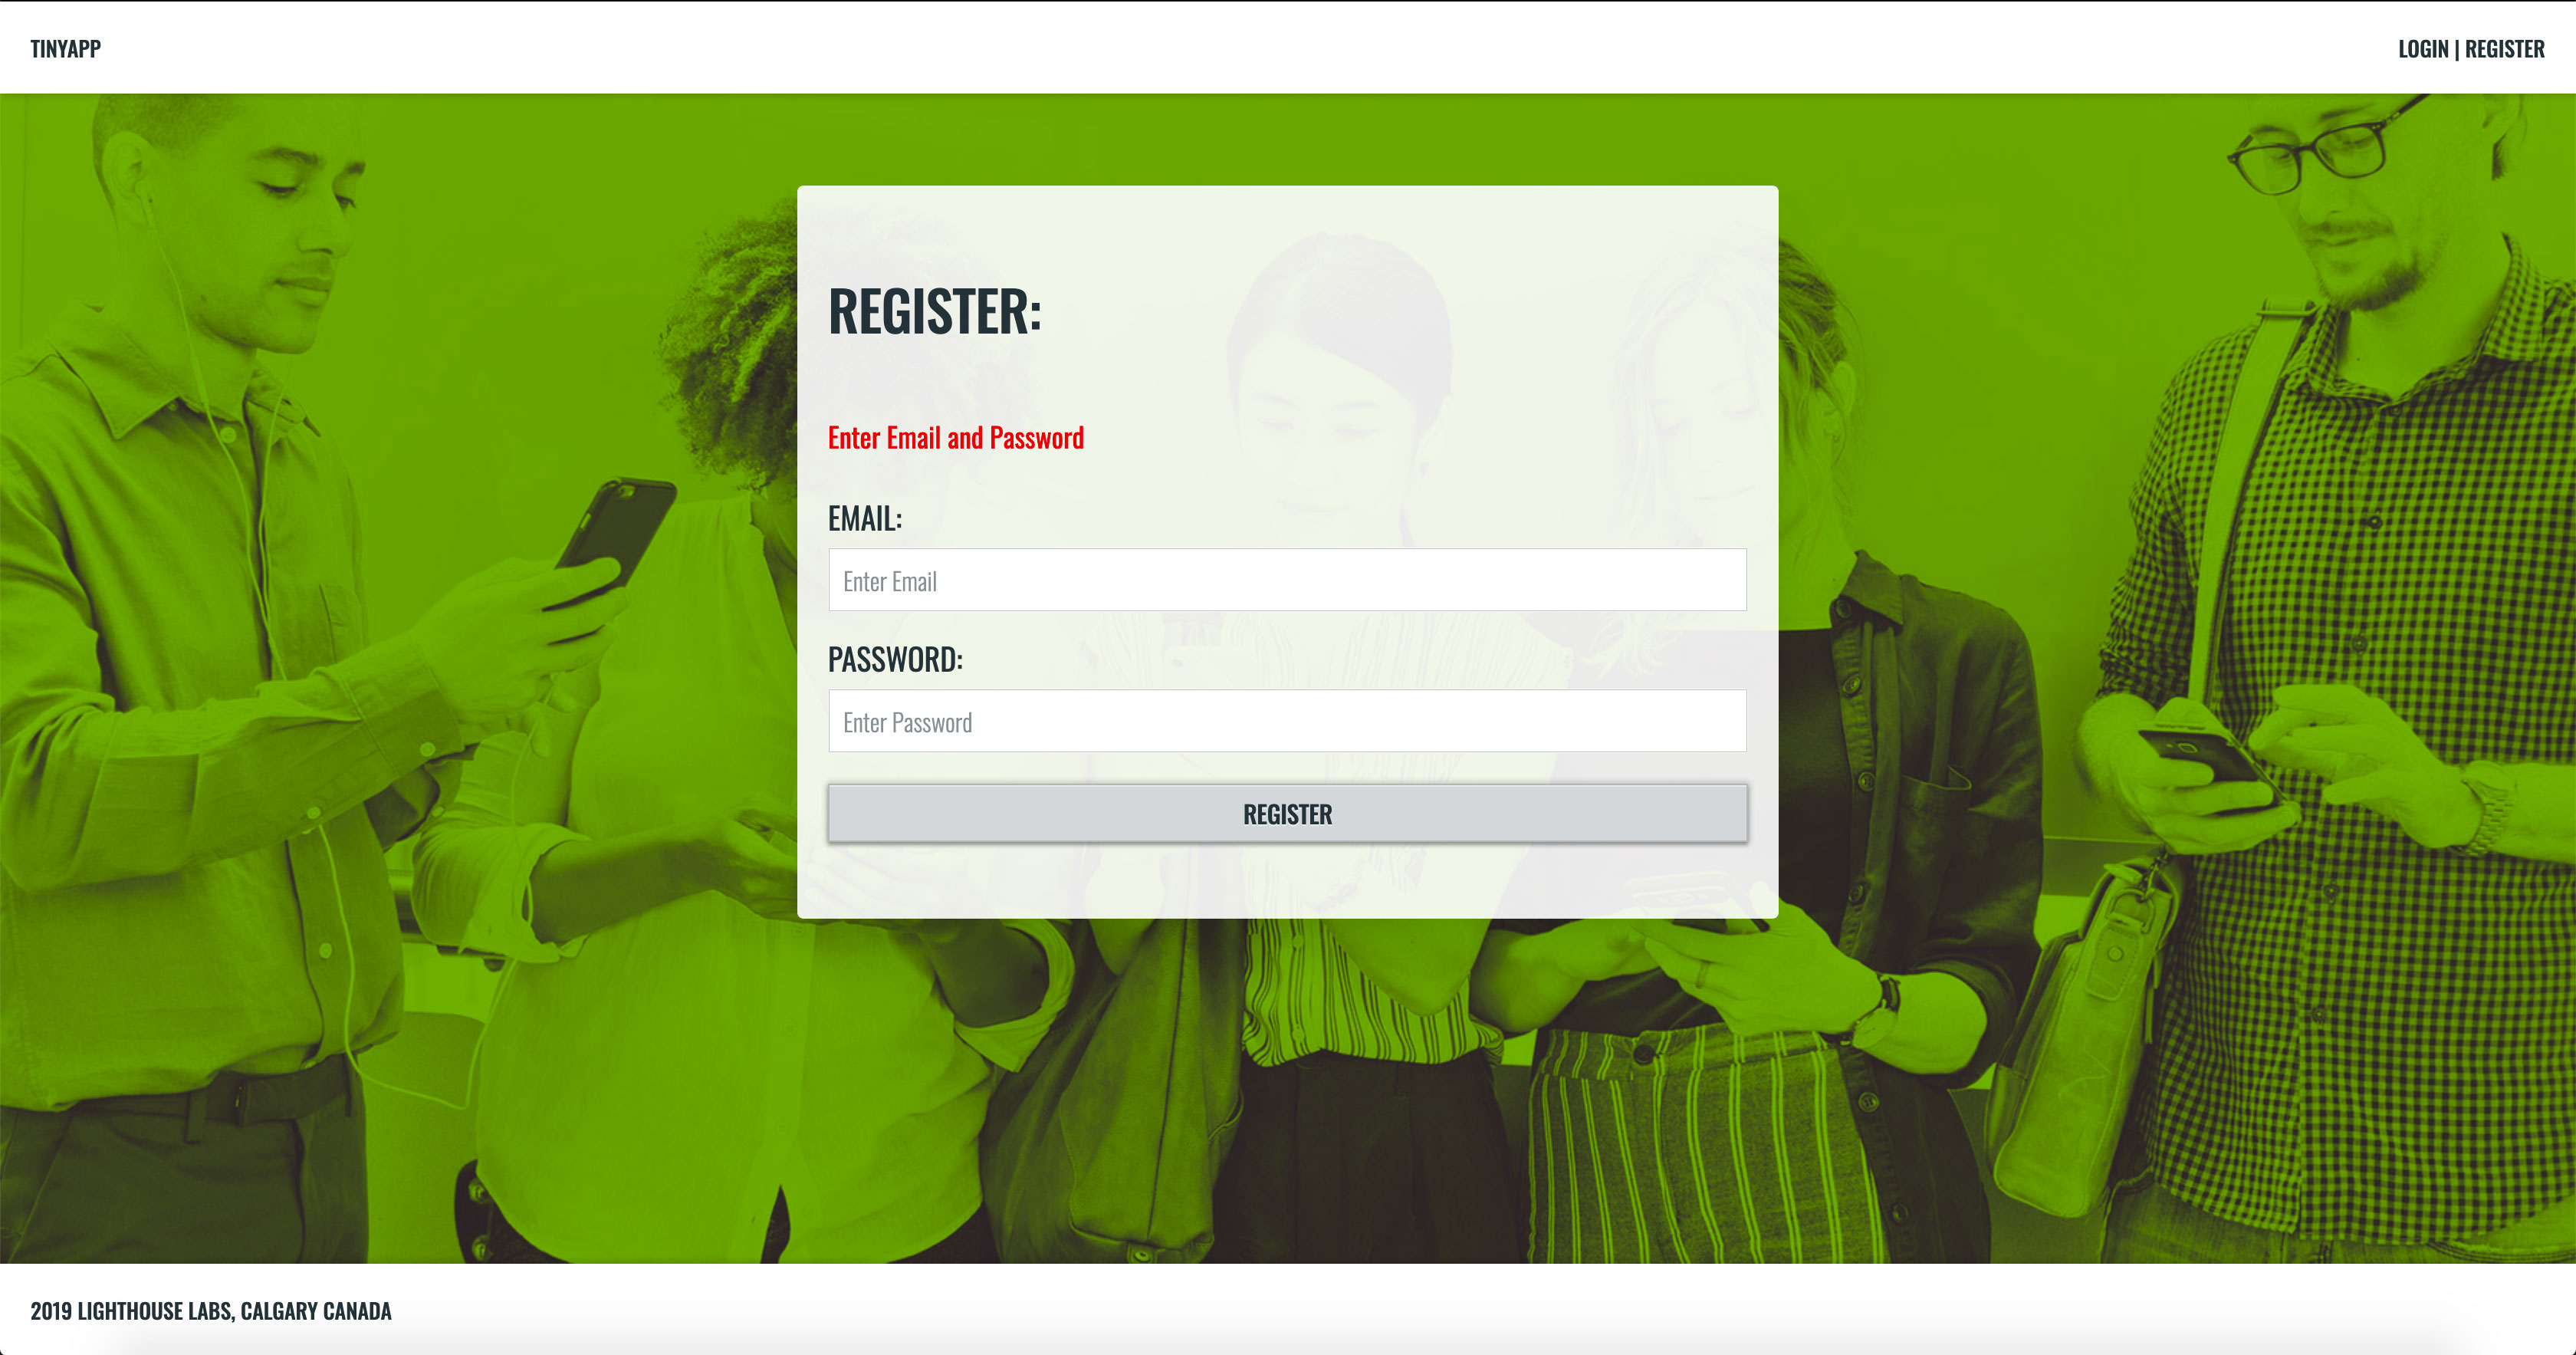 TinyApp Register Page - Error Message